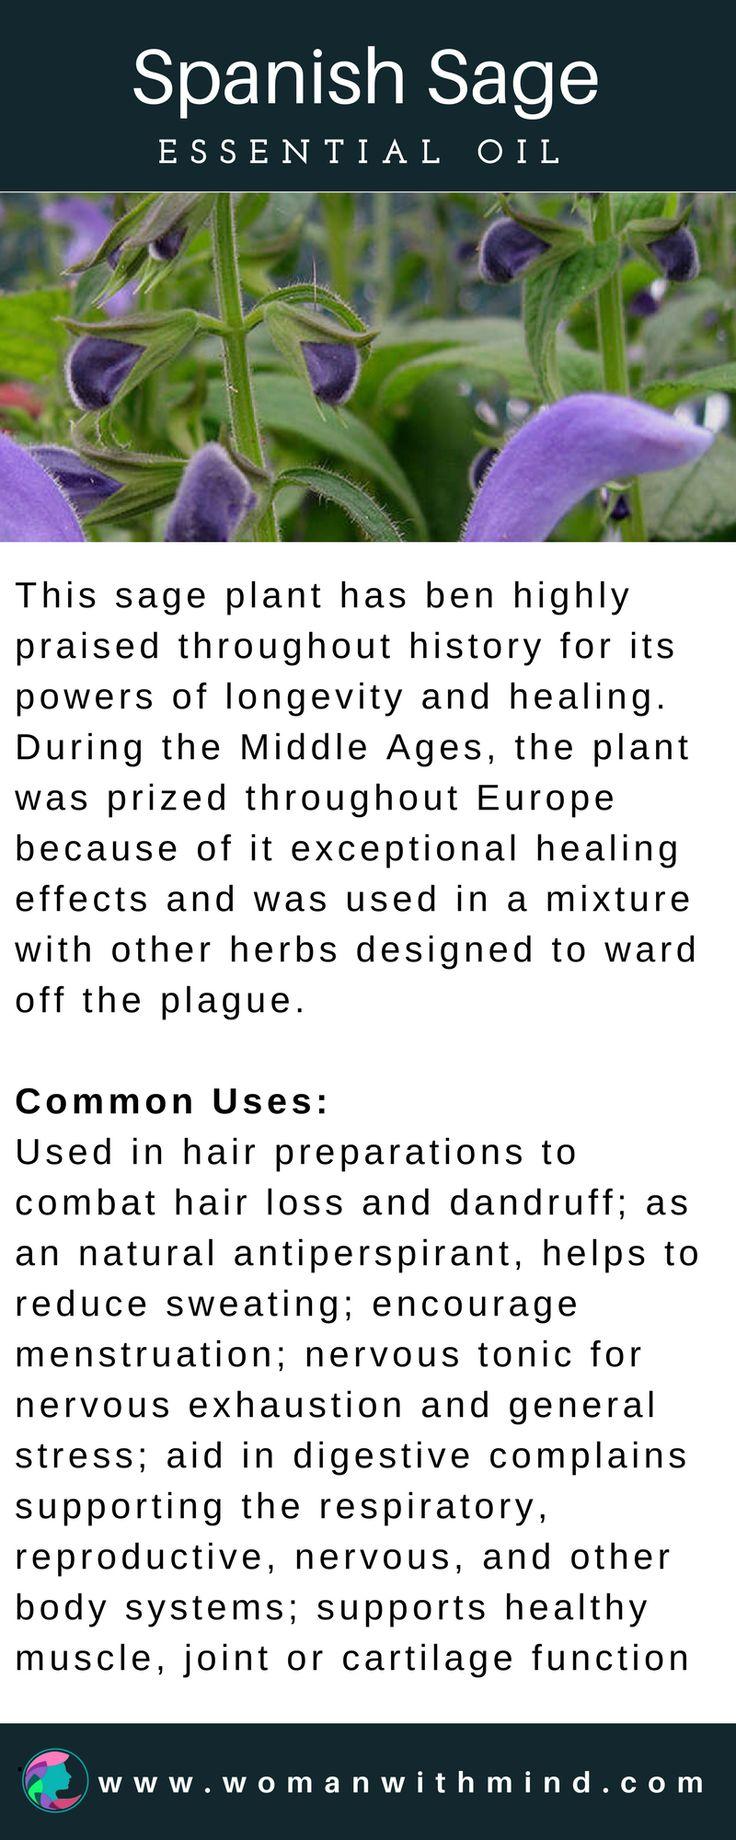 Spanish Sage Essential Oil Guide & Application #essentialoils